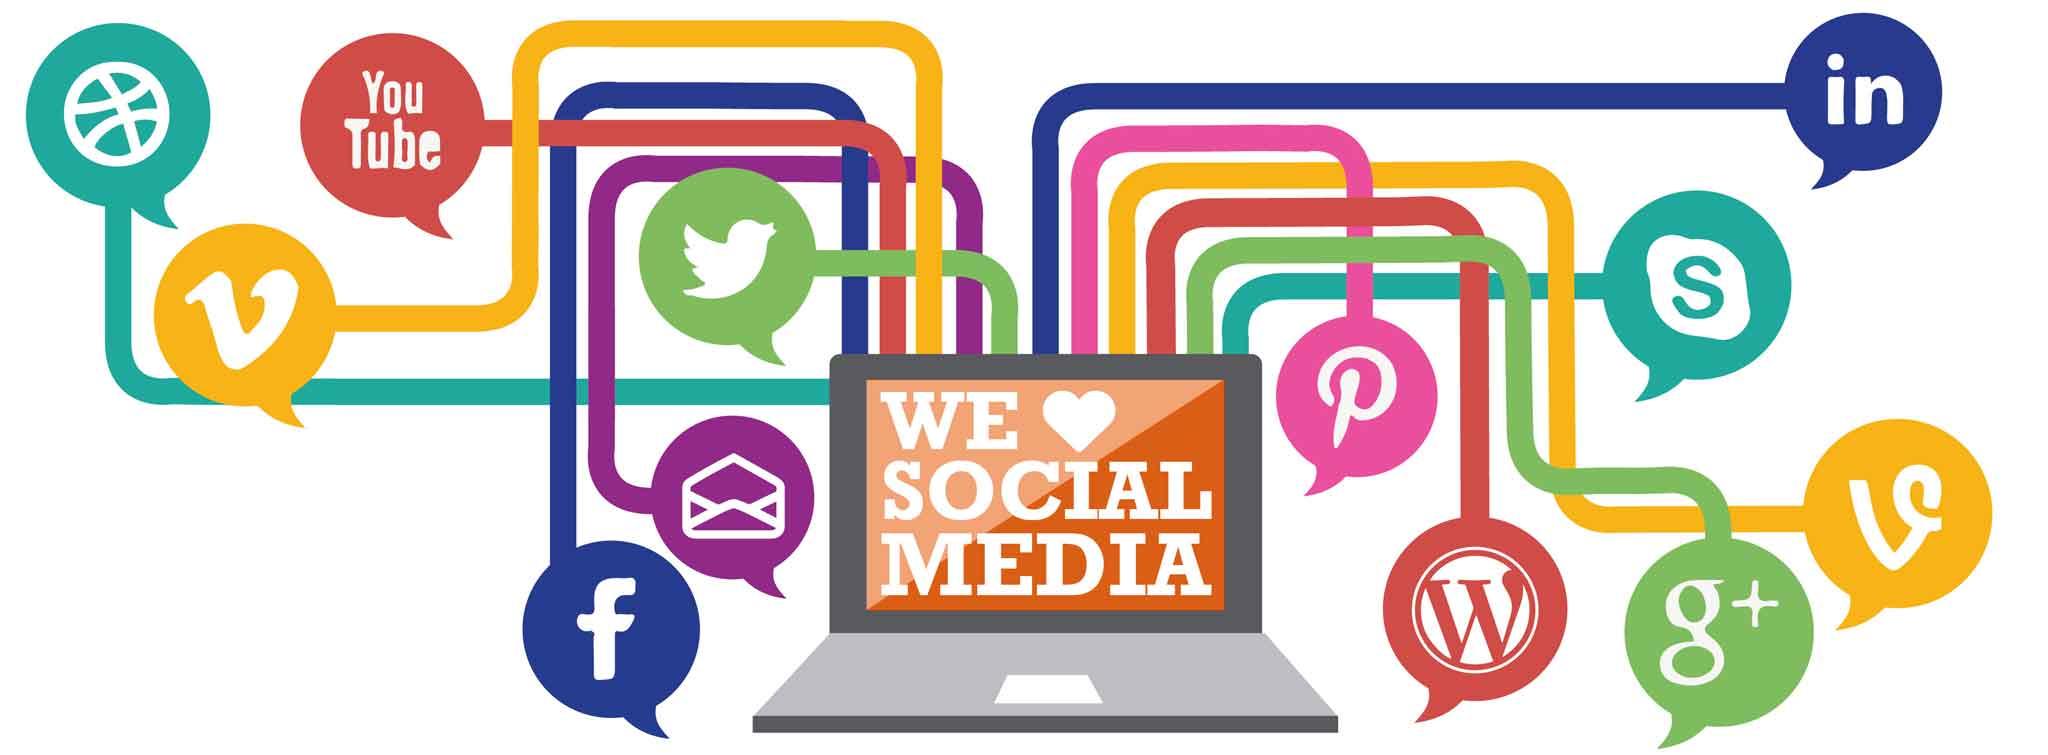 Instagram e social guida